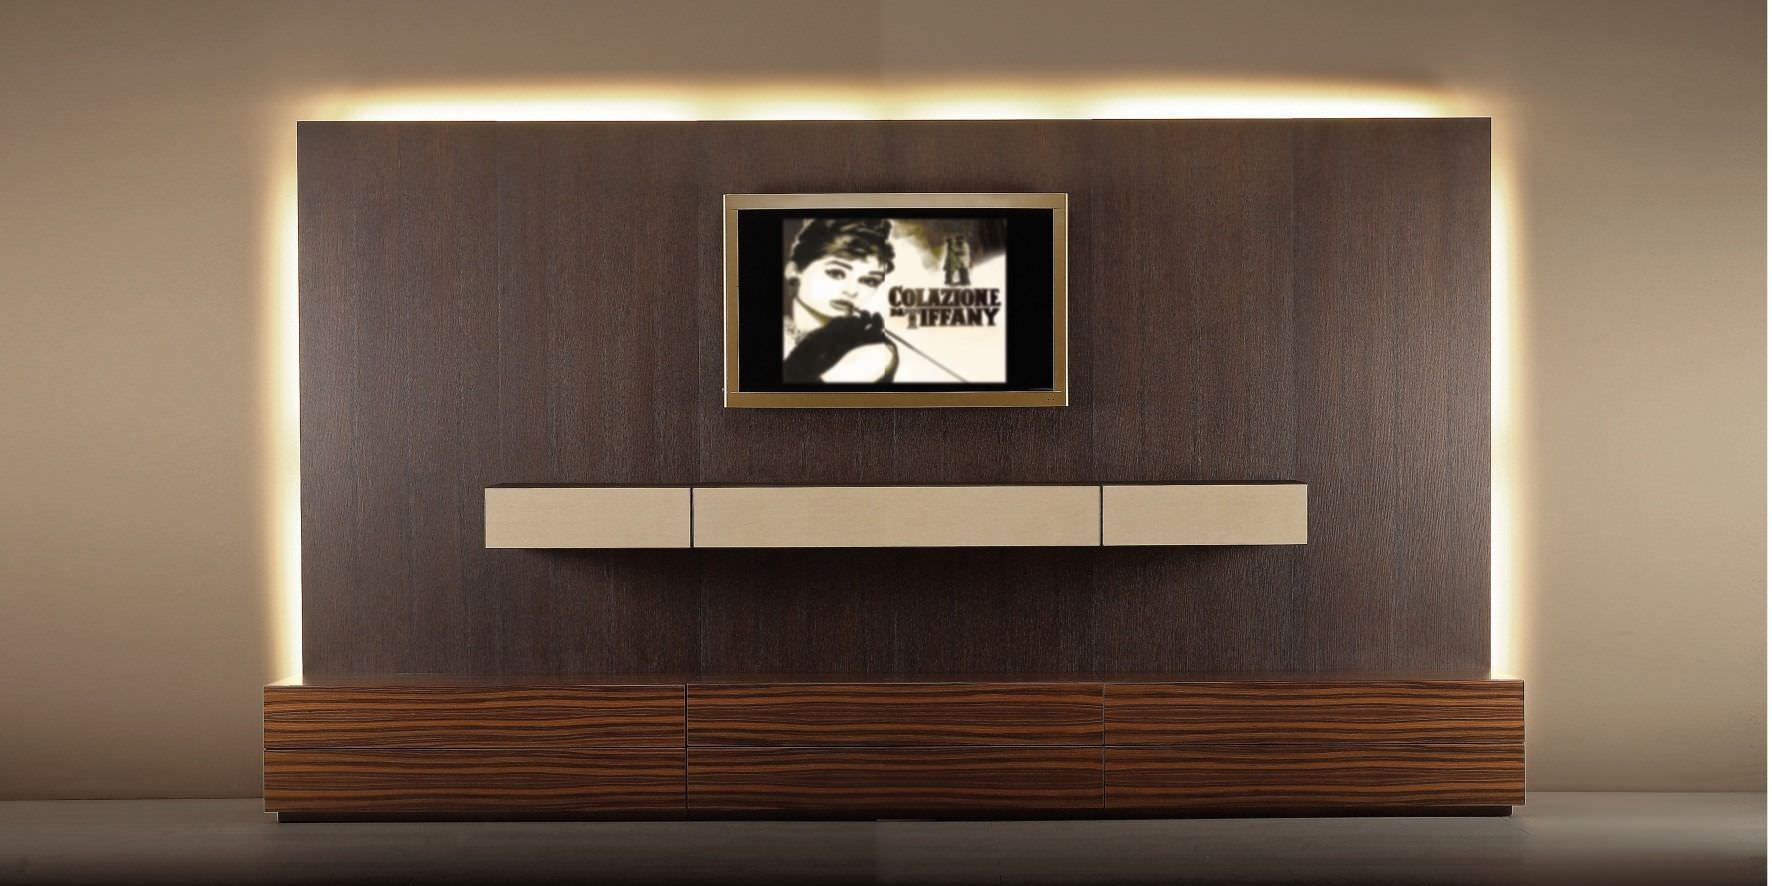 Wohnwand design holz  Moderne Wohnwand / Holz - valentini mobili s.r.l.